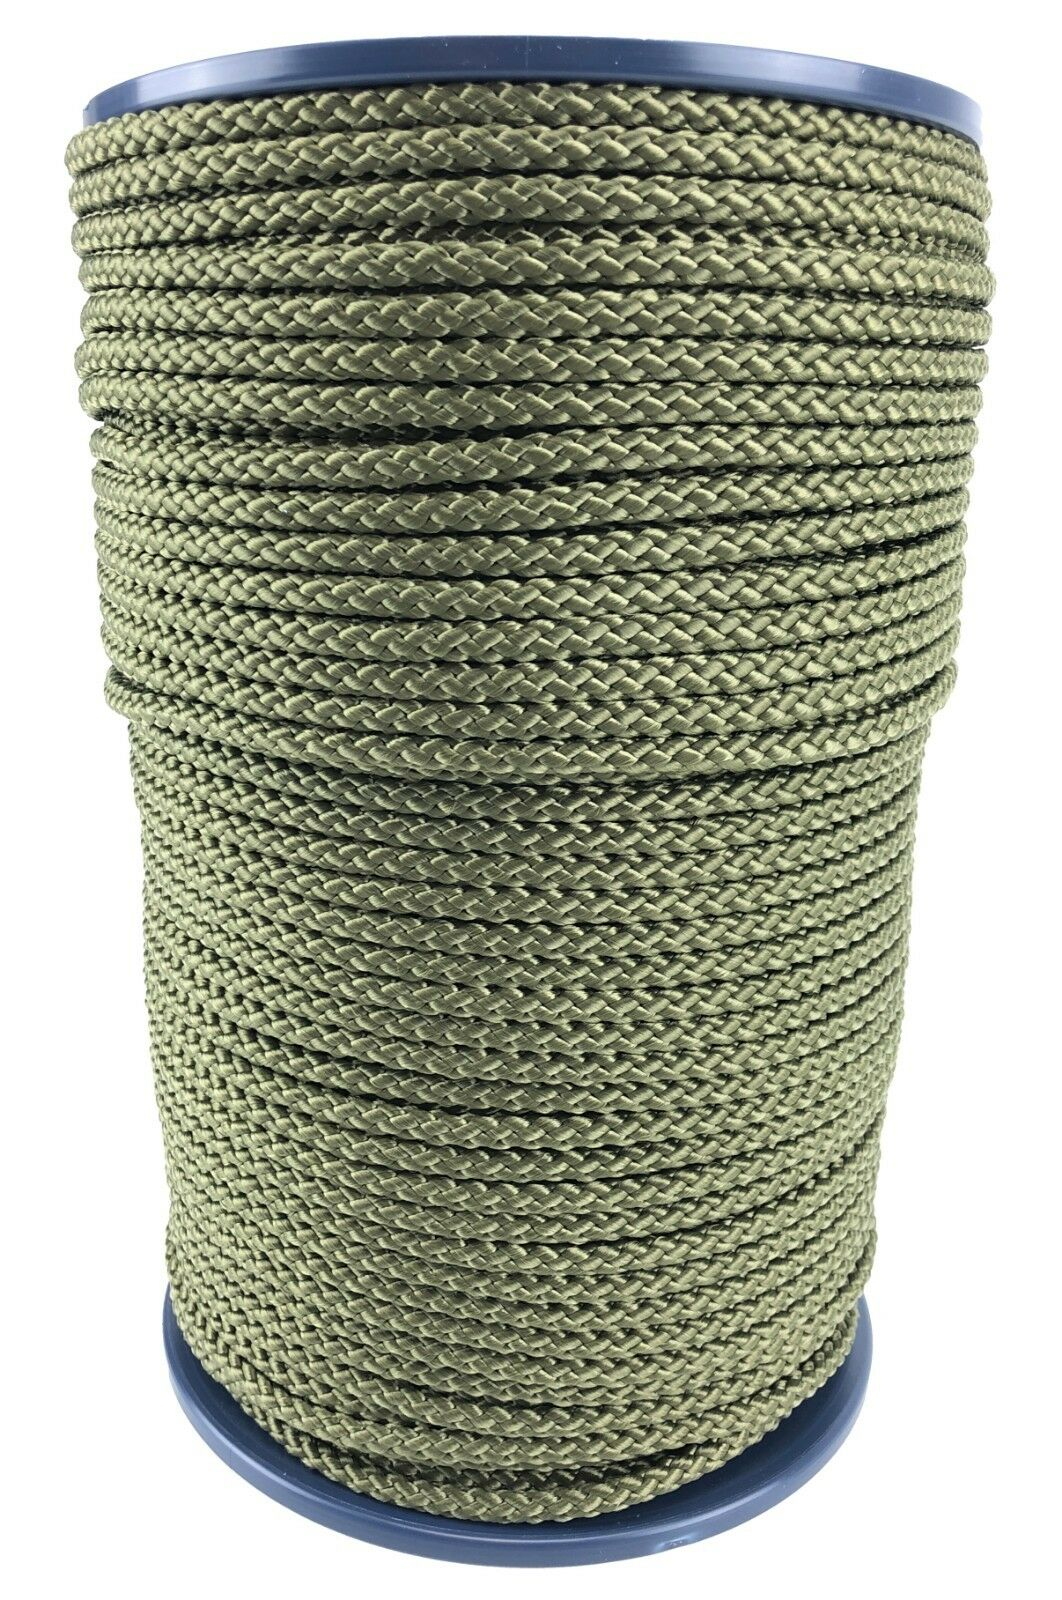 6mm Olive Khaki Braided Polypropylene Poly Rope Cord Paracord Drawstring Sailing